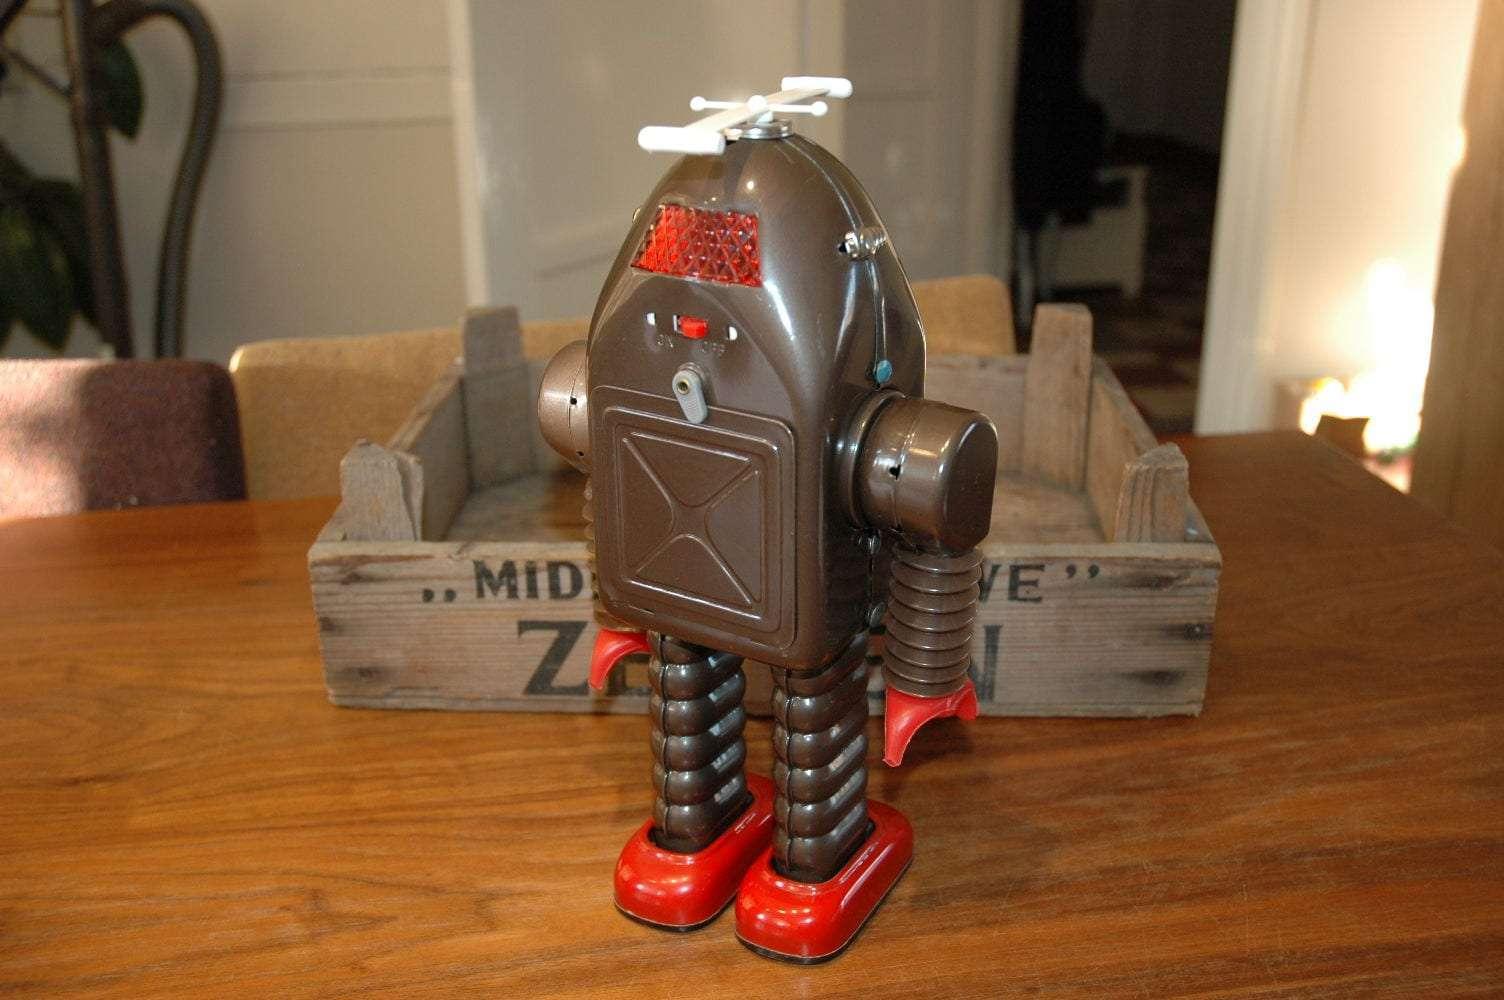 Asakusa - Thunder Robot Prototype / first test run